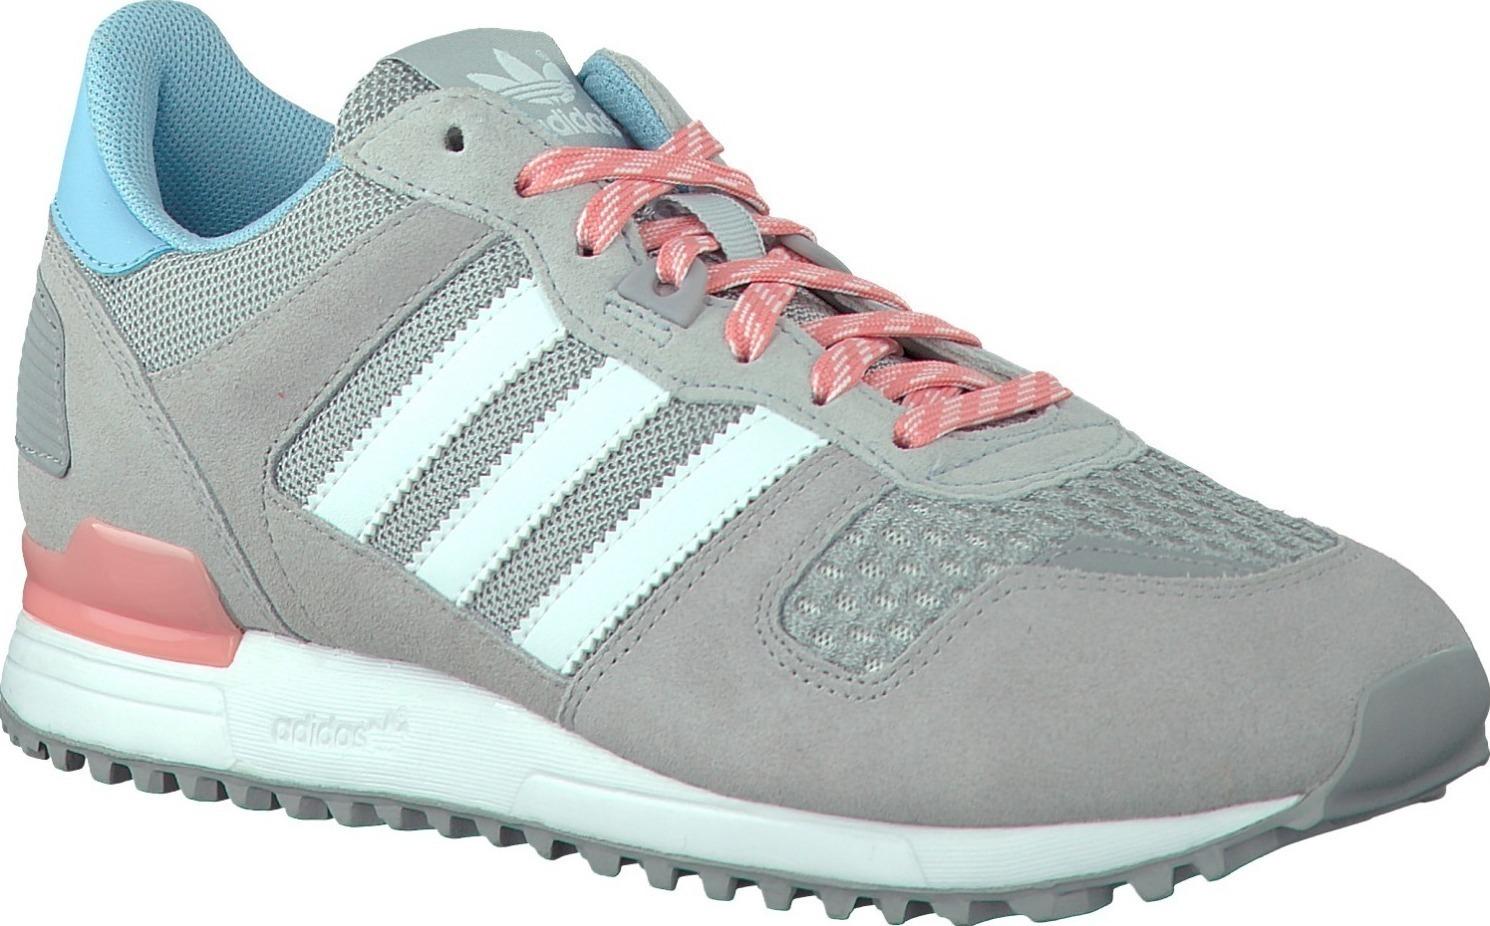 6018ea30fdc98 adidas originals zx 700 - Sneakers - Skroutz.gr